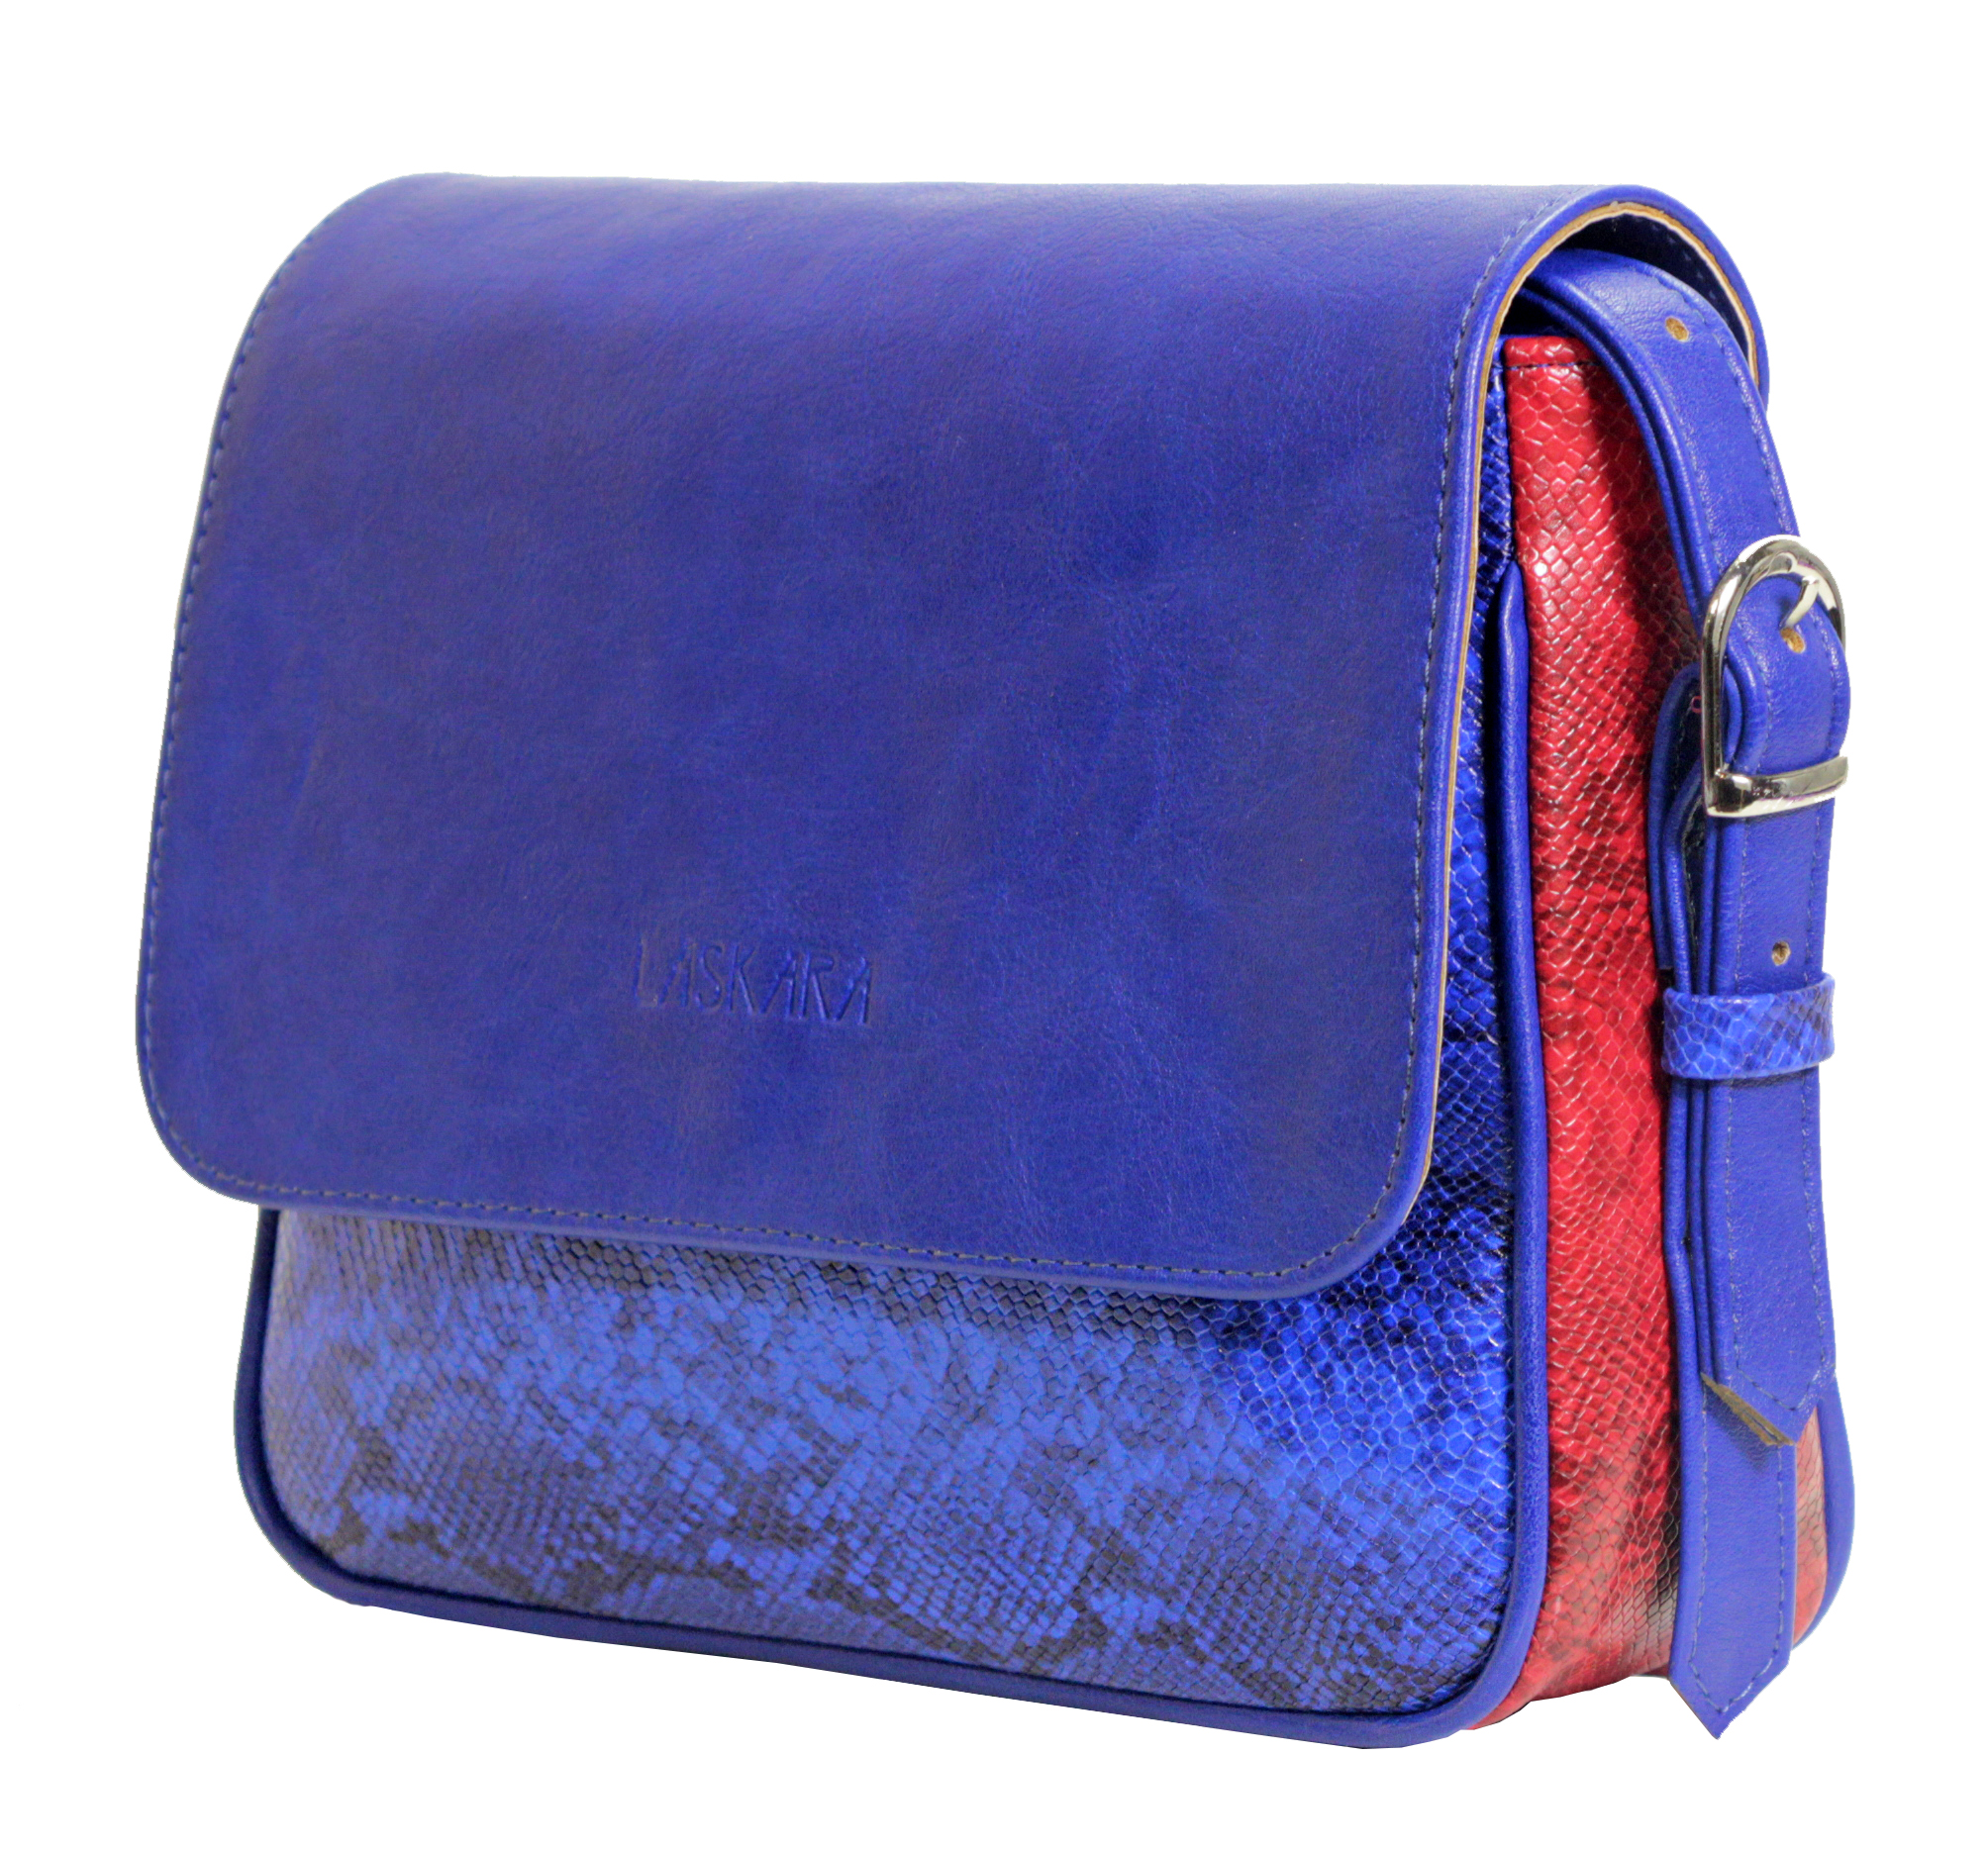 Crossbody kabelka s hadím vzorem 11-10245-blue-snake - bok